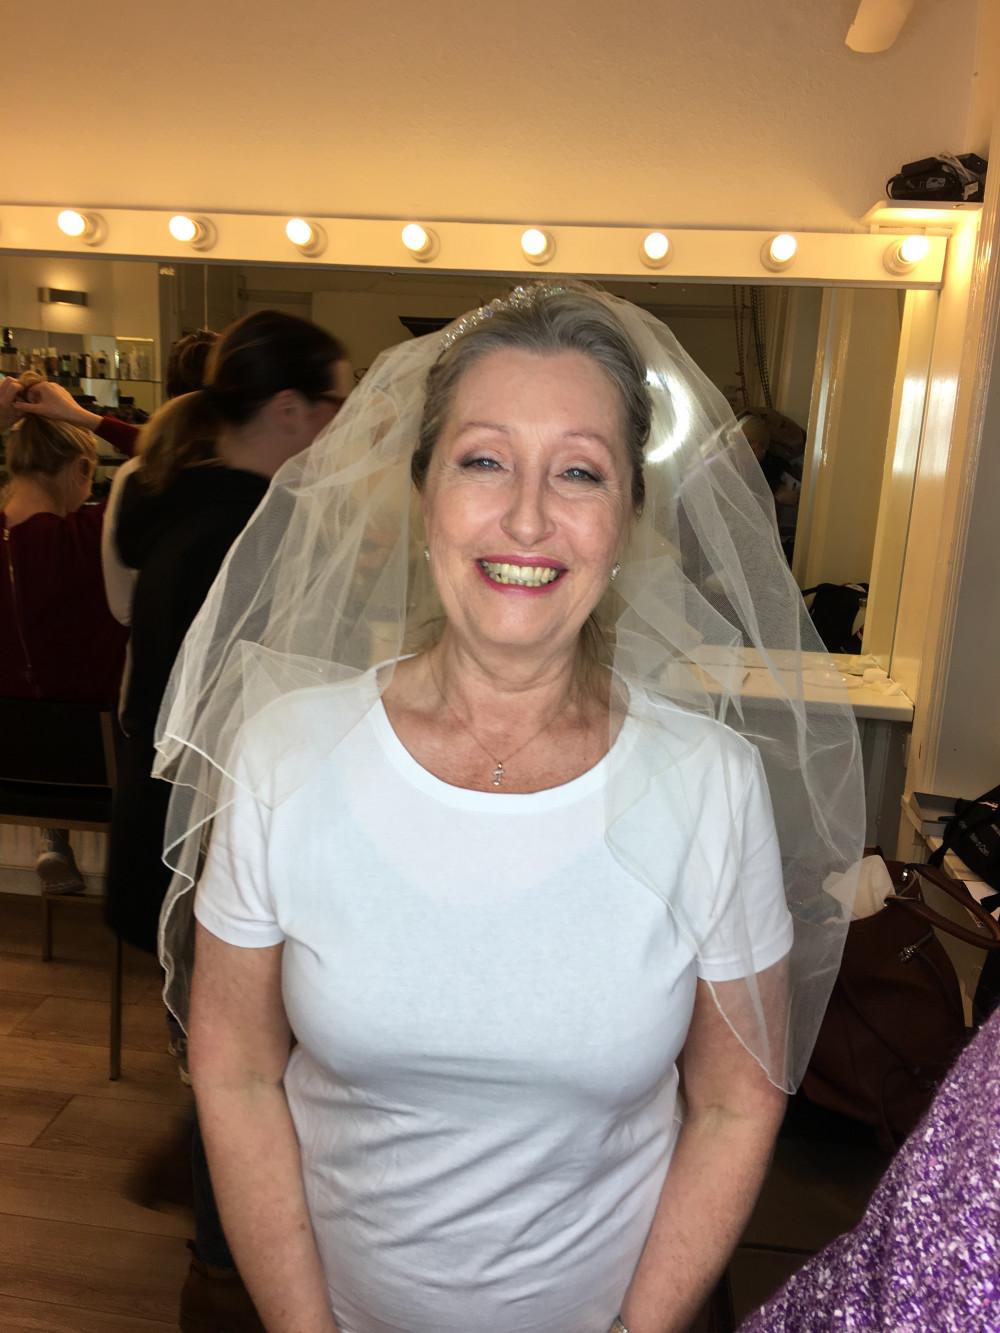 Beautiful makeup for a mature bride on set - Make Me Bridal Artist: Abbi Parsley MUA. #naturalmakeup #matureskin #bride #maturebride